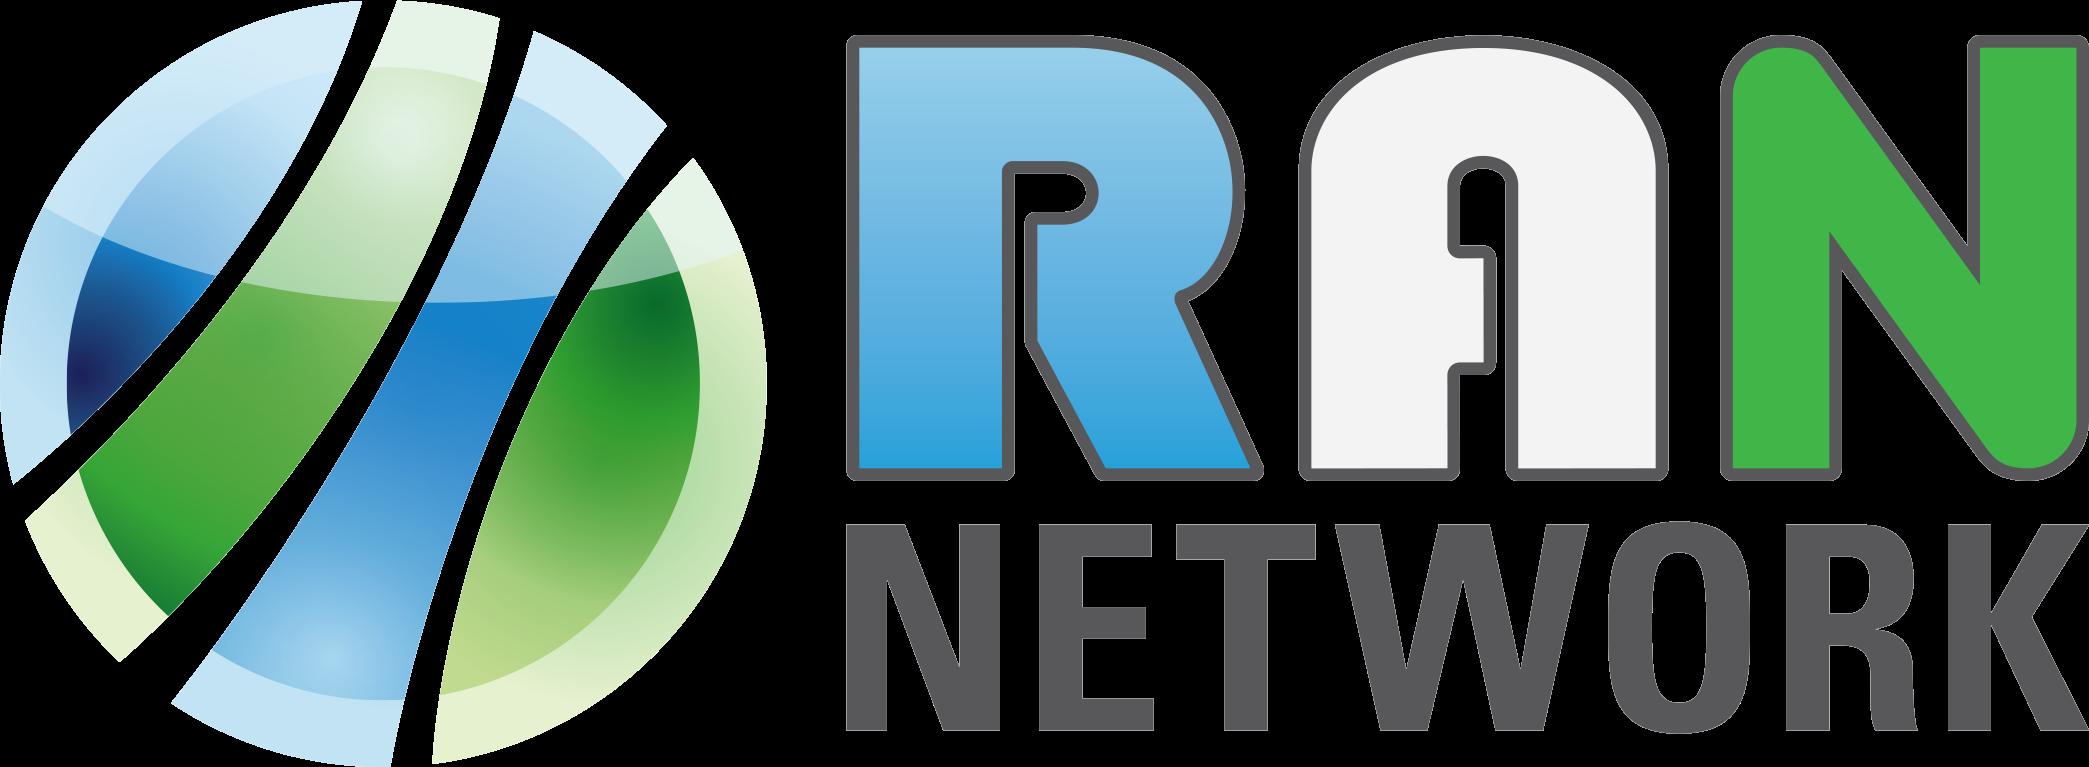 RAN Logo 2015 Vector.png